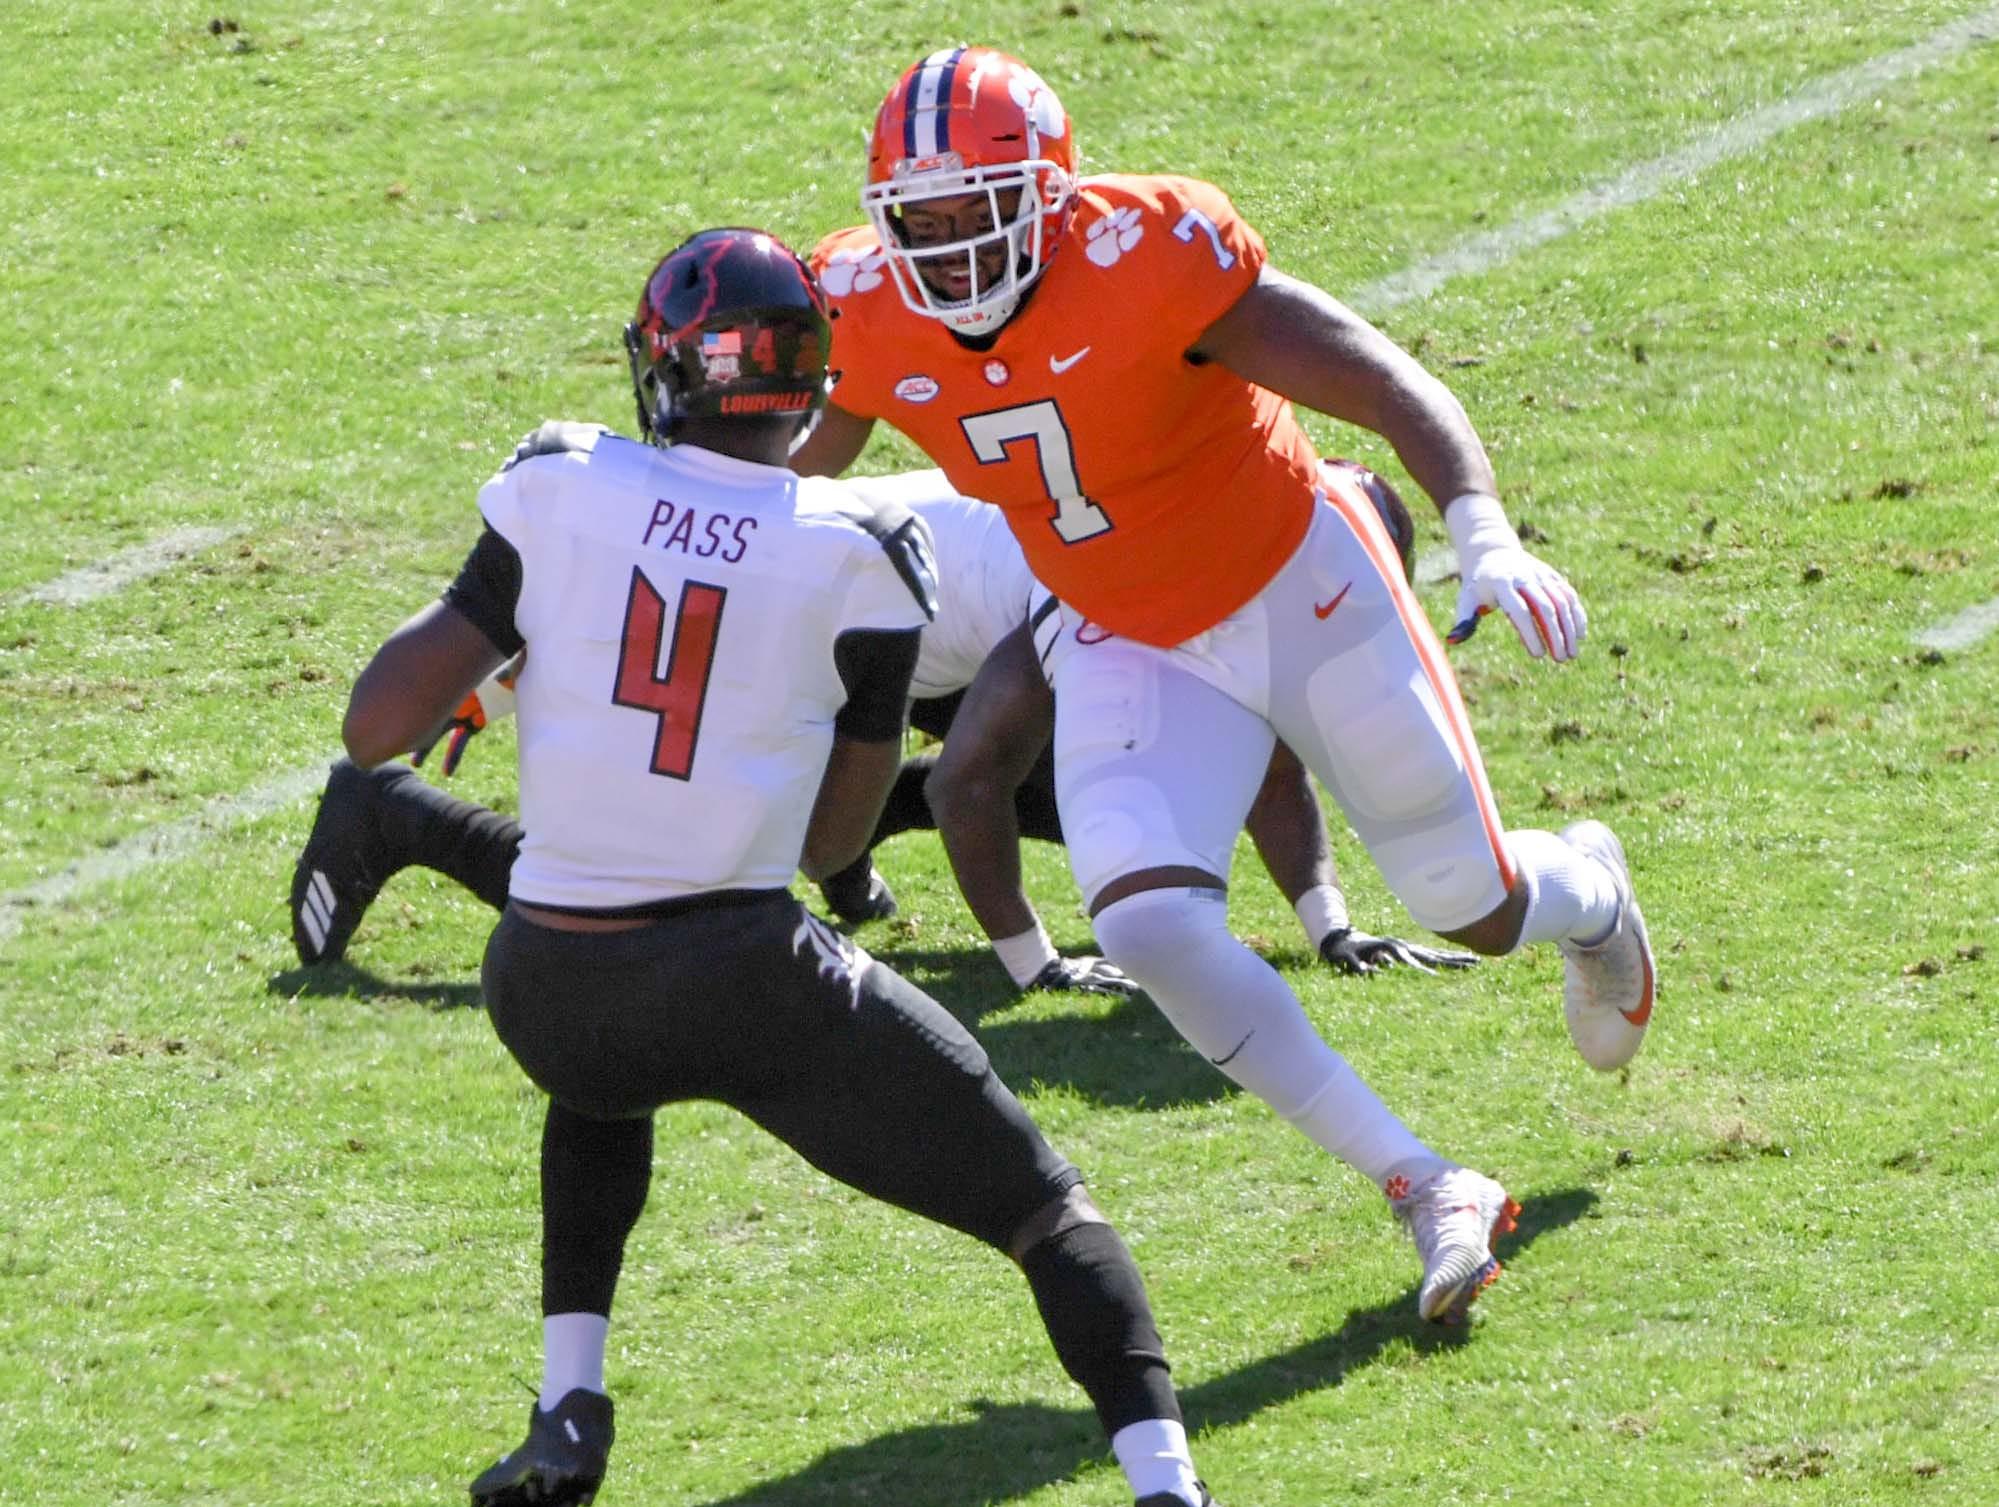 Clemson defensive lineman Austin Bryant (7) sacks Louisville quarterback Jawon Pass(4) during the first quarter in Memorial Stadium on Saturday, November 3, 2018.